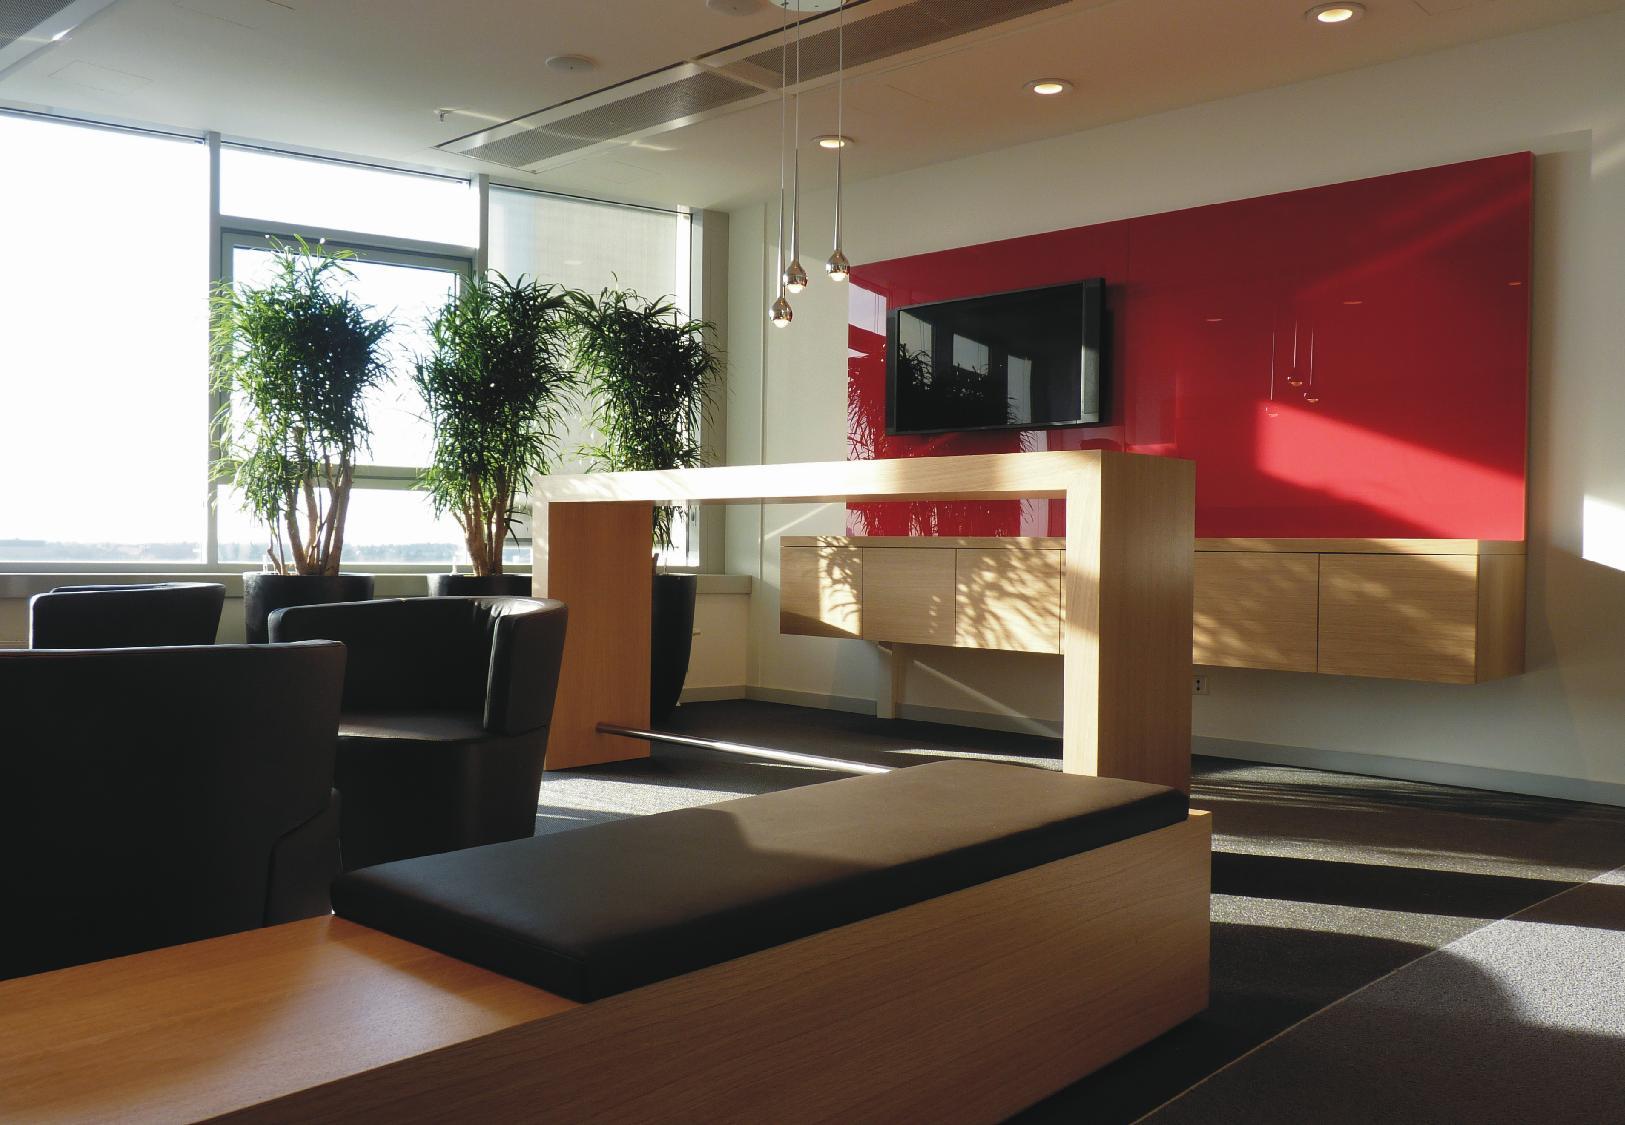 01-lounge.jpg